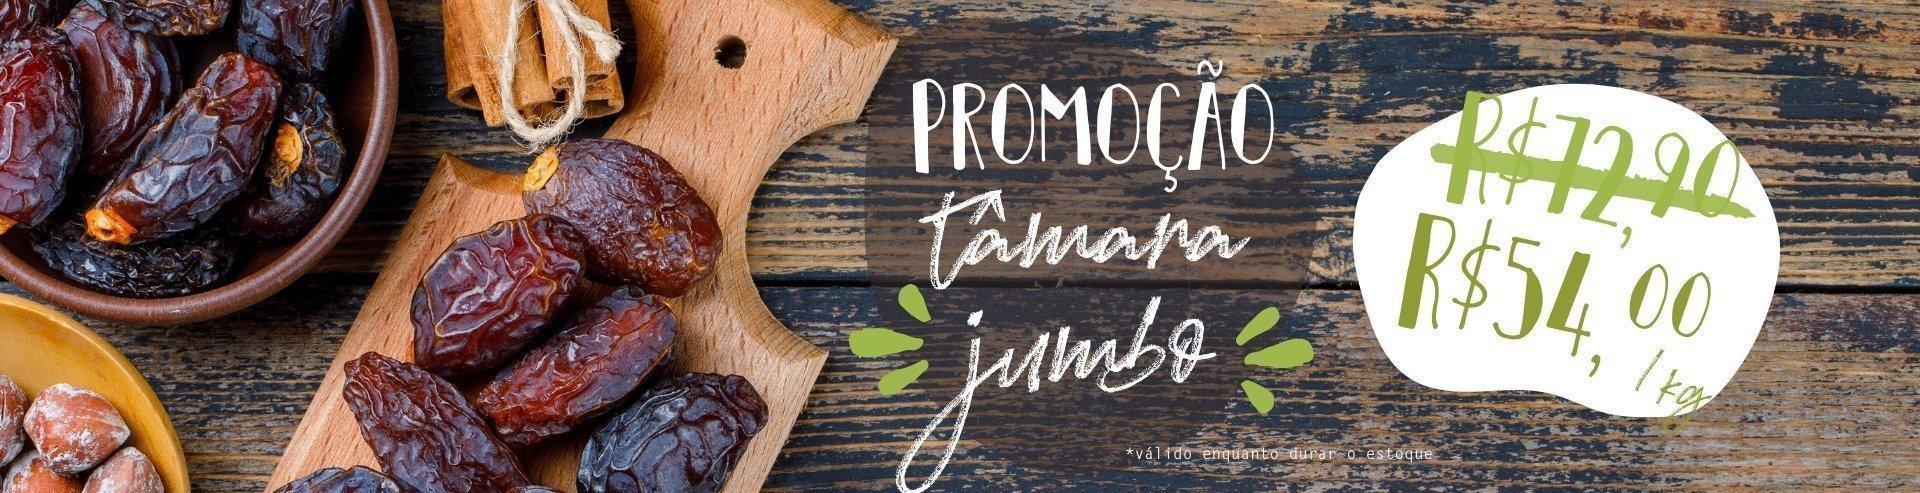 PROMO TAMARA